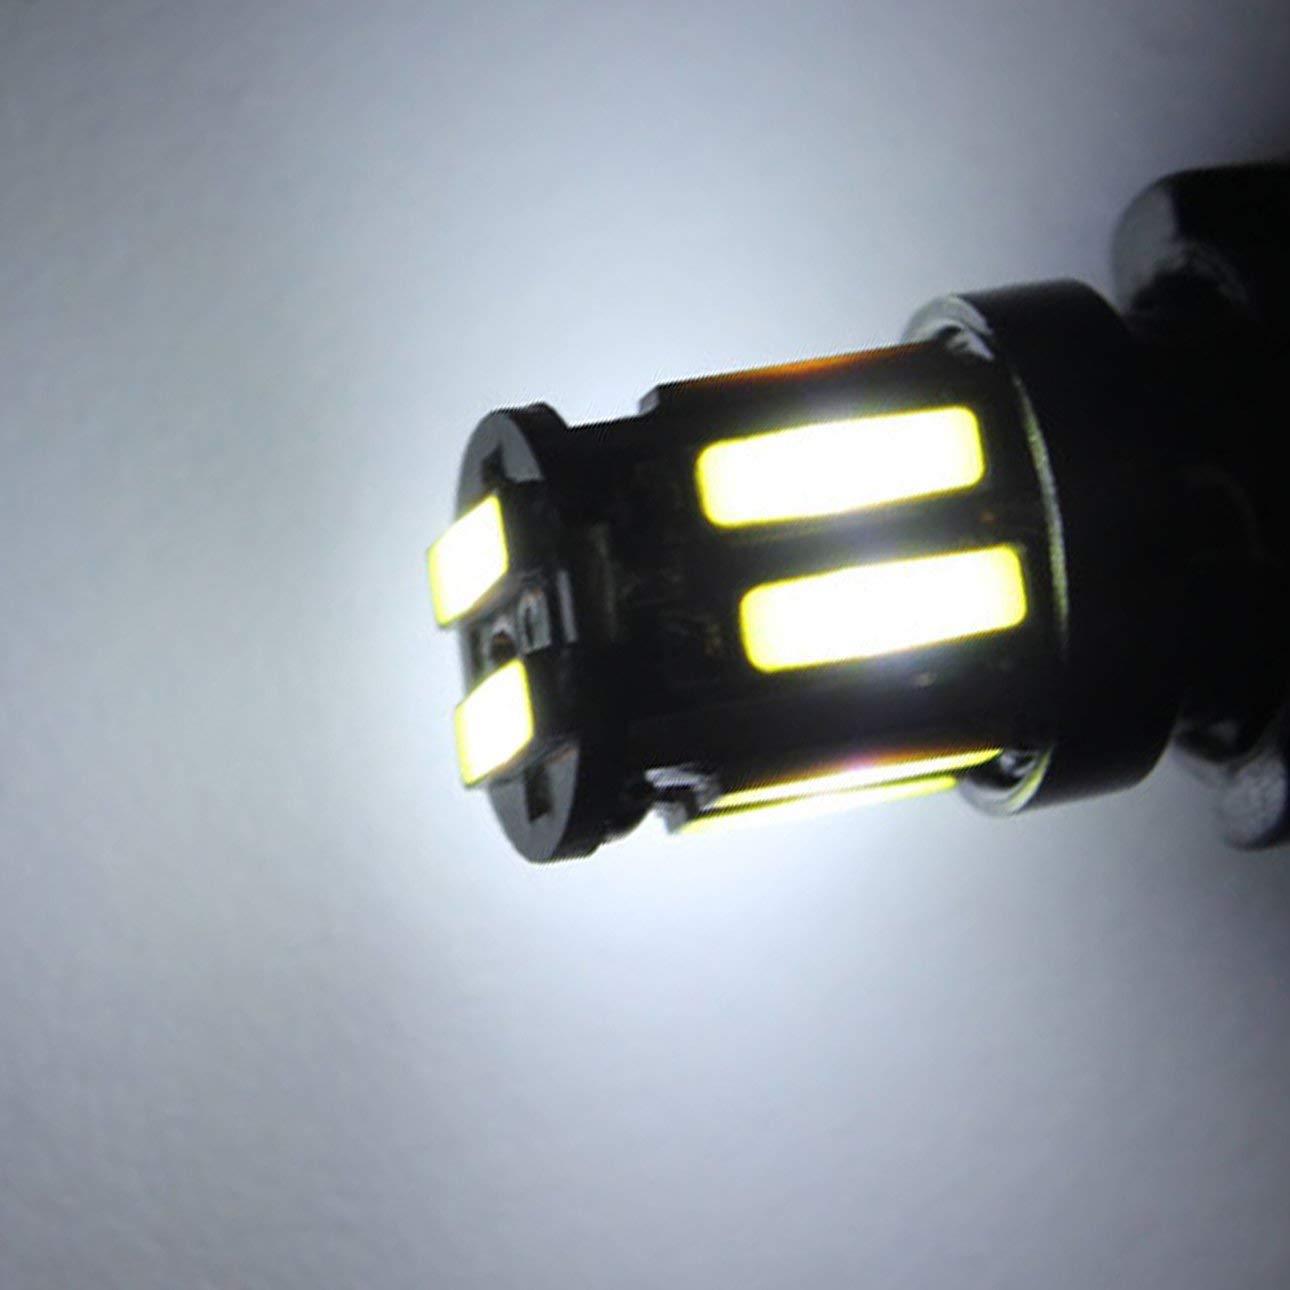 Pudincoco multifunci/ón T10 7020 10pcs LED l/ámpara Ancho luz Auto Led l/ámparas de conducci/ón